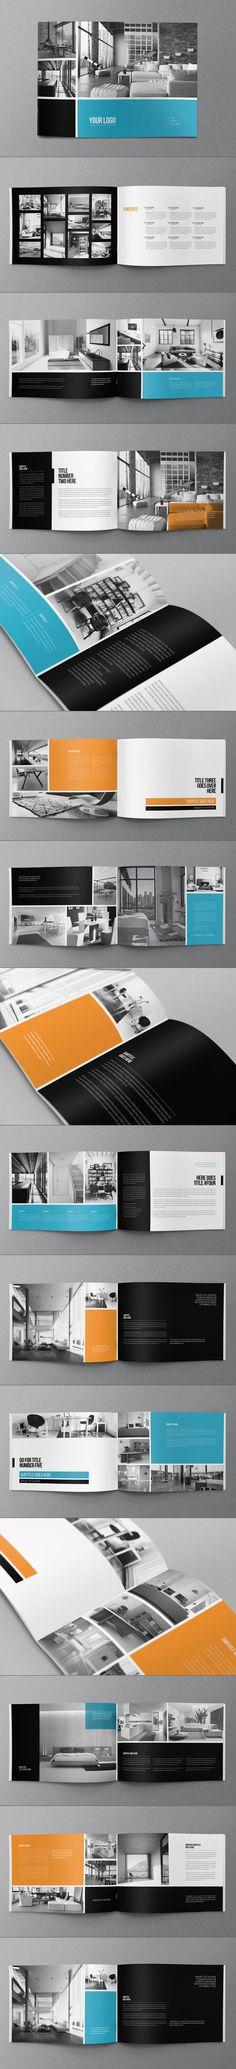 Minimal Modern Brochure. Download here: http://graphicriver.net/item/minimal-modern-brochure/8819275?ref=abradesign #brochure #design: